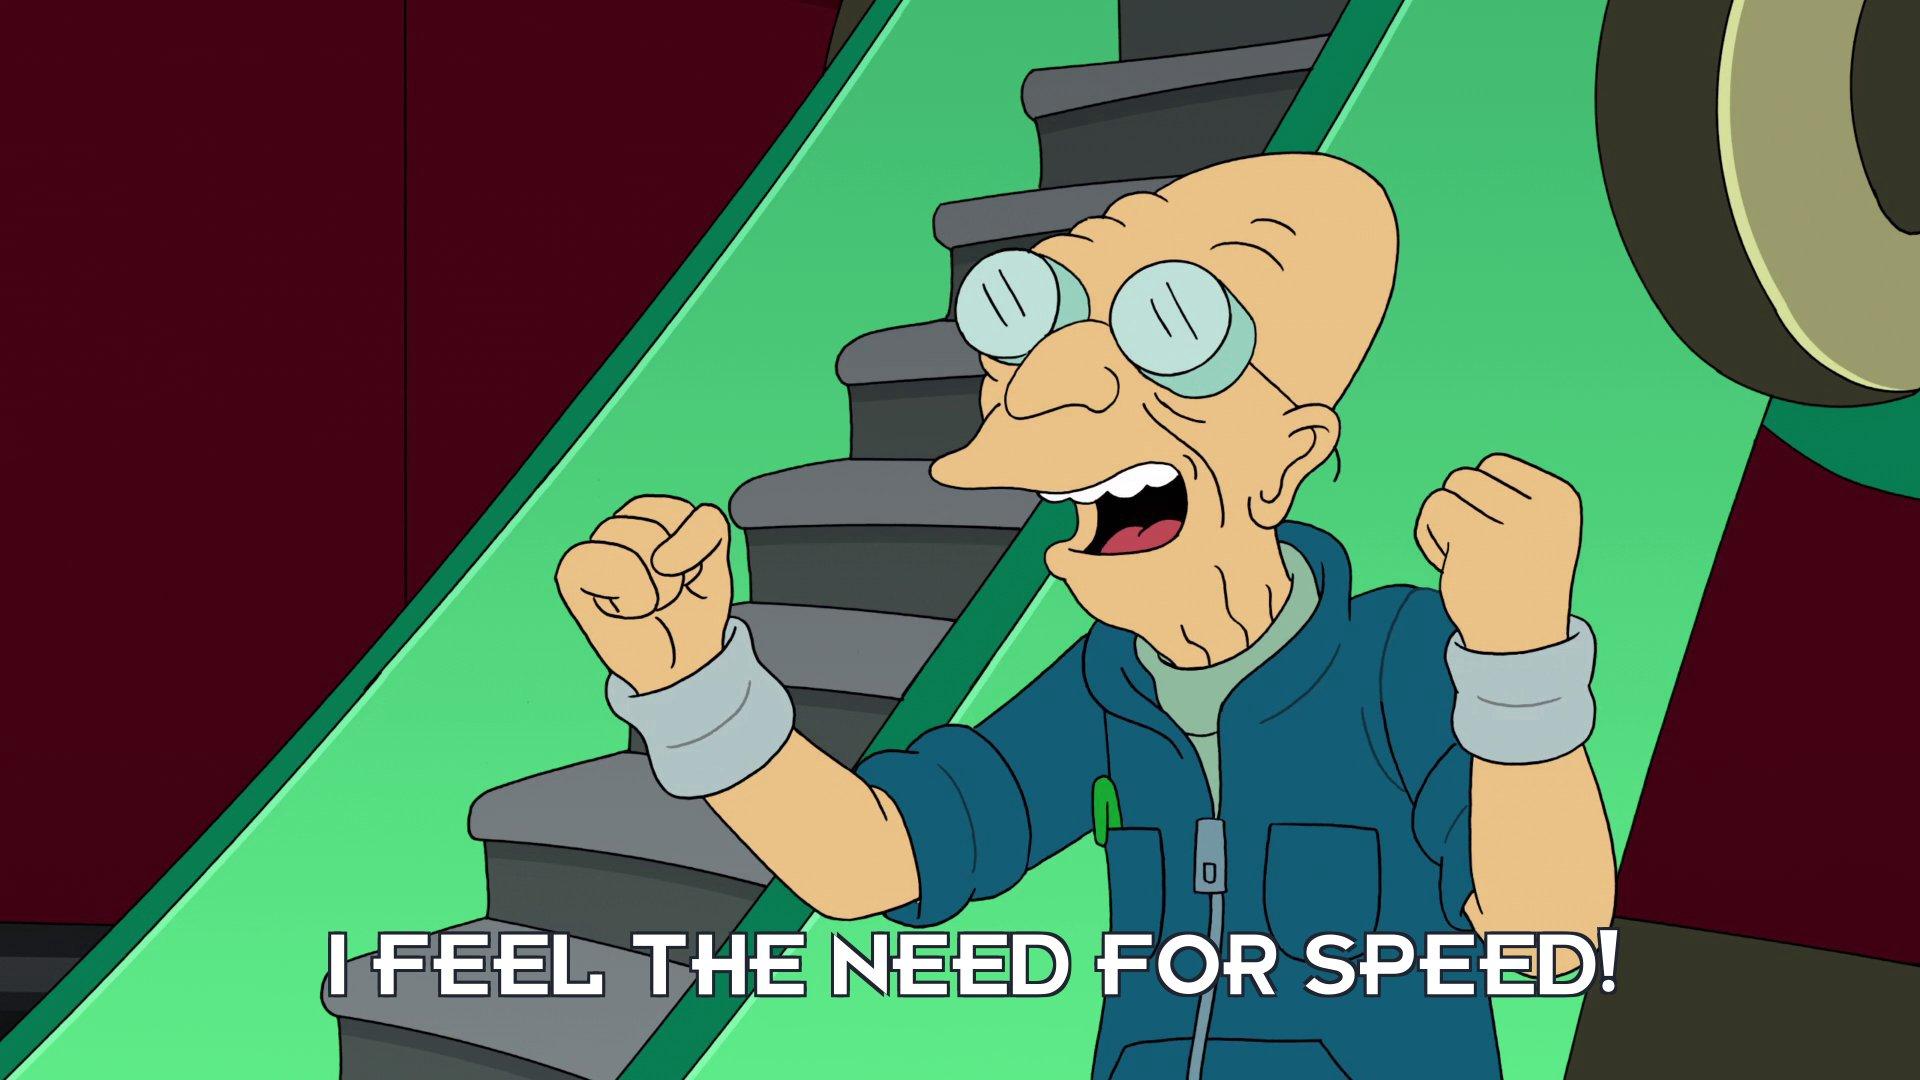 Prof Hubert J Farnsworth: I feel the need for speed!